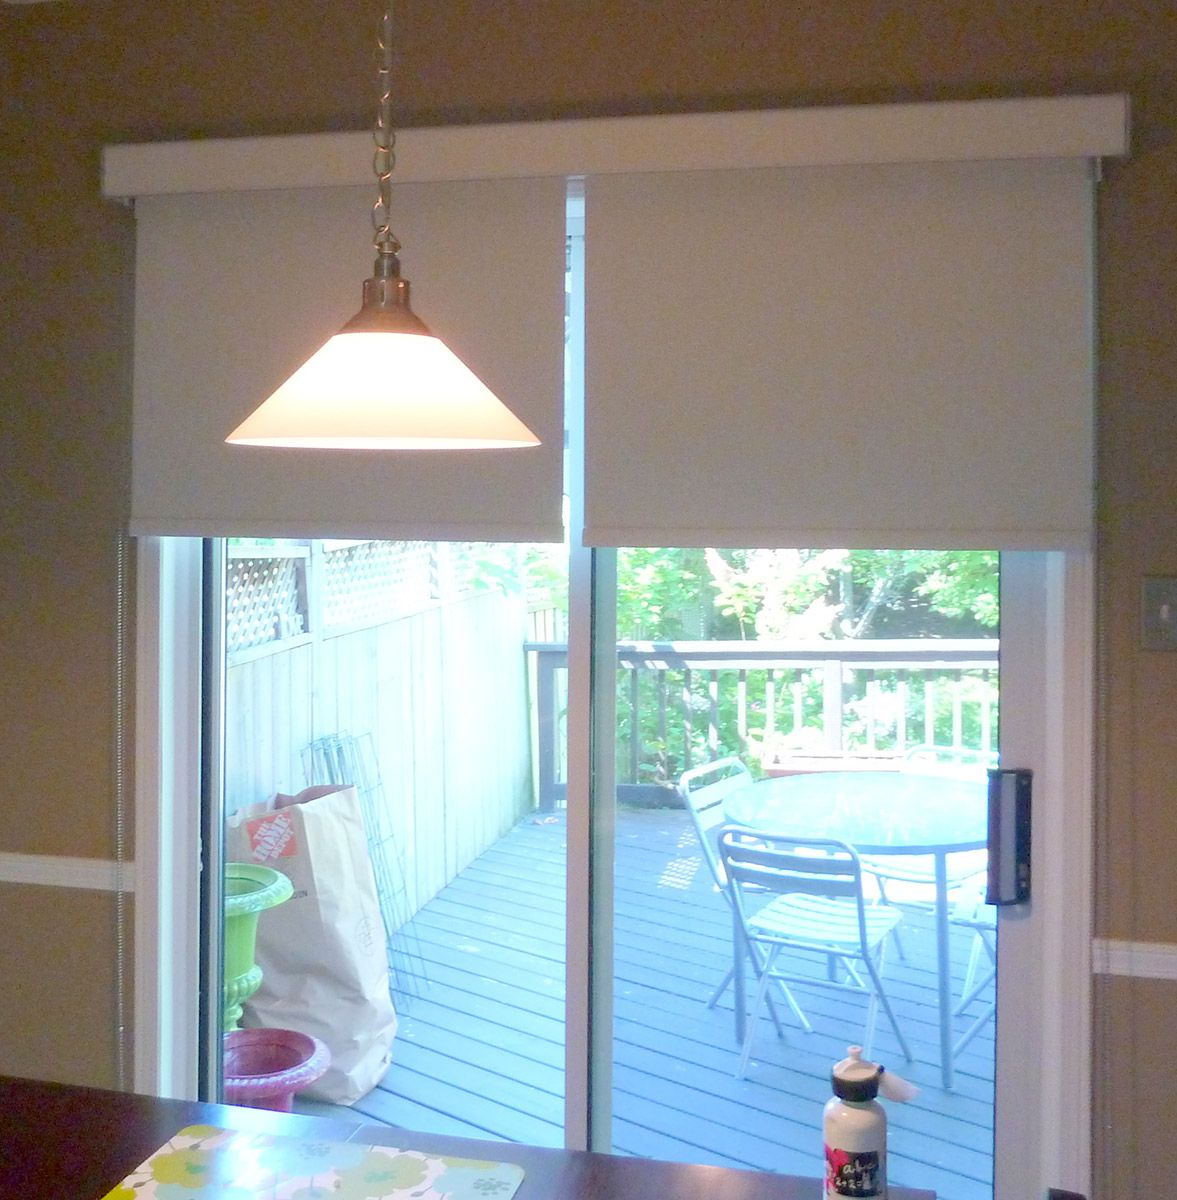 Door window coverings  statuette of the options of window coverings for sliding glass door